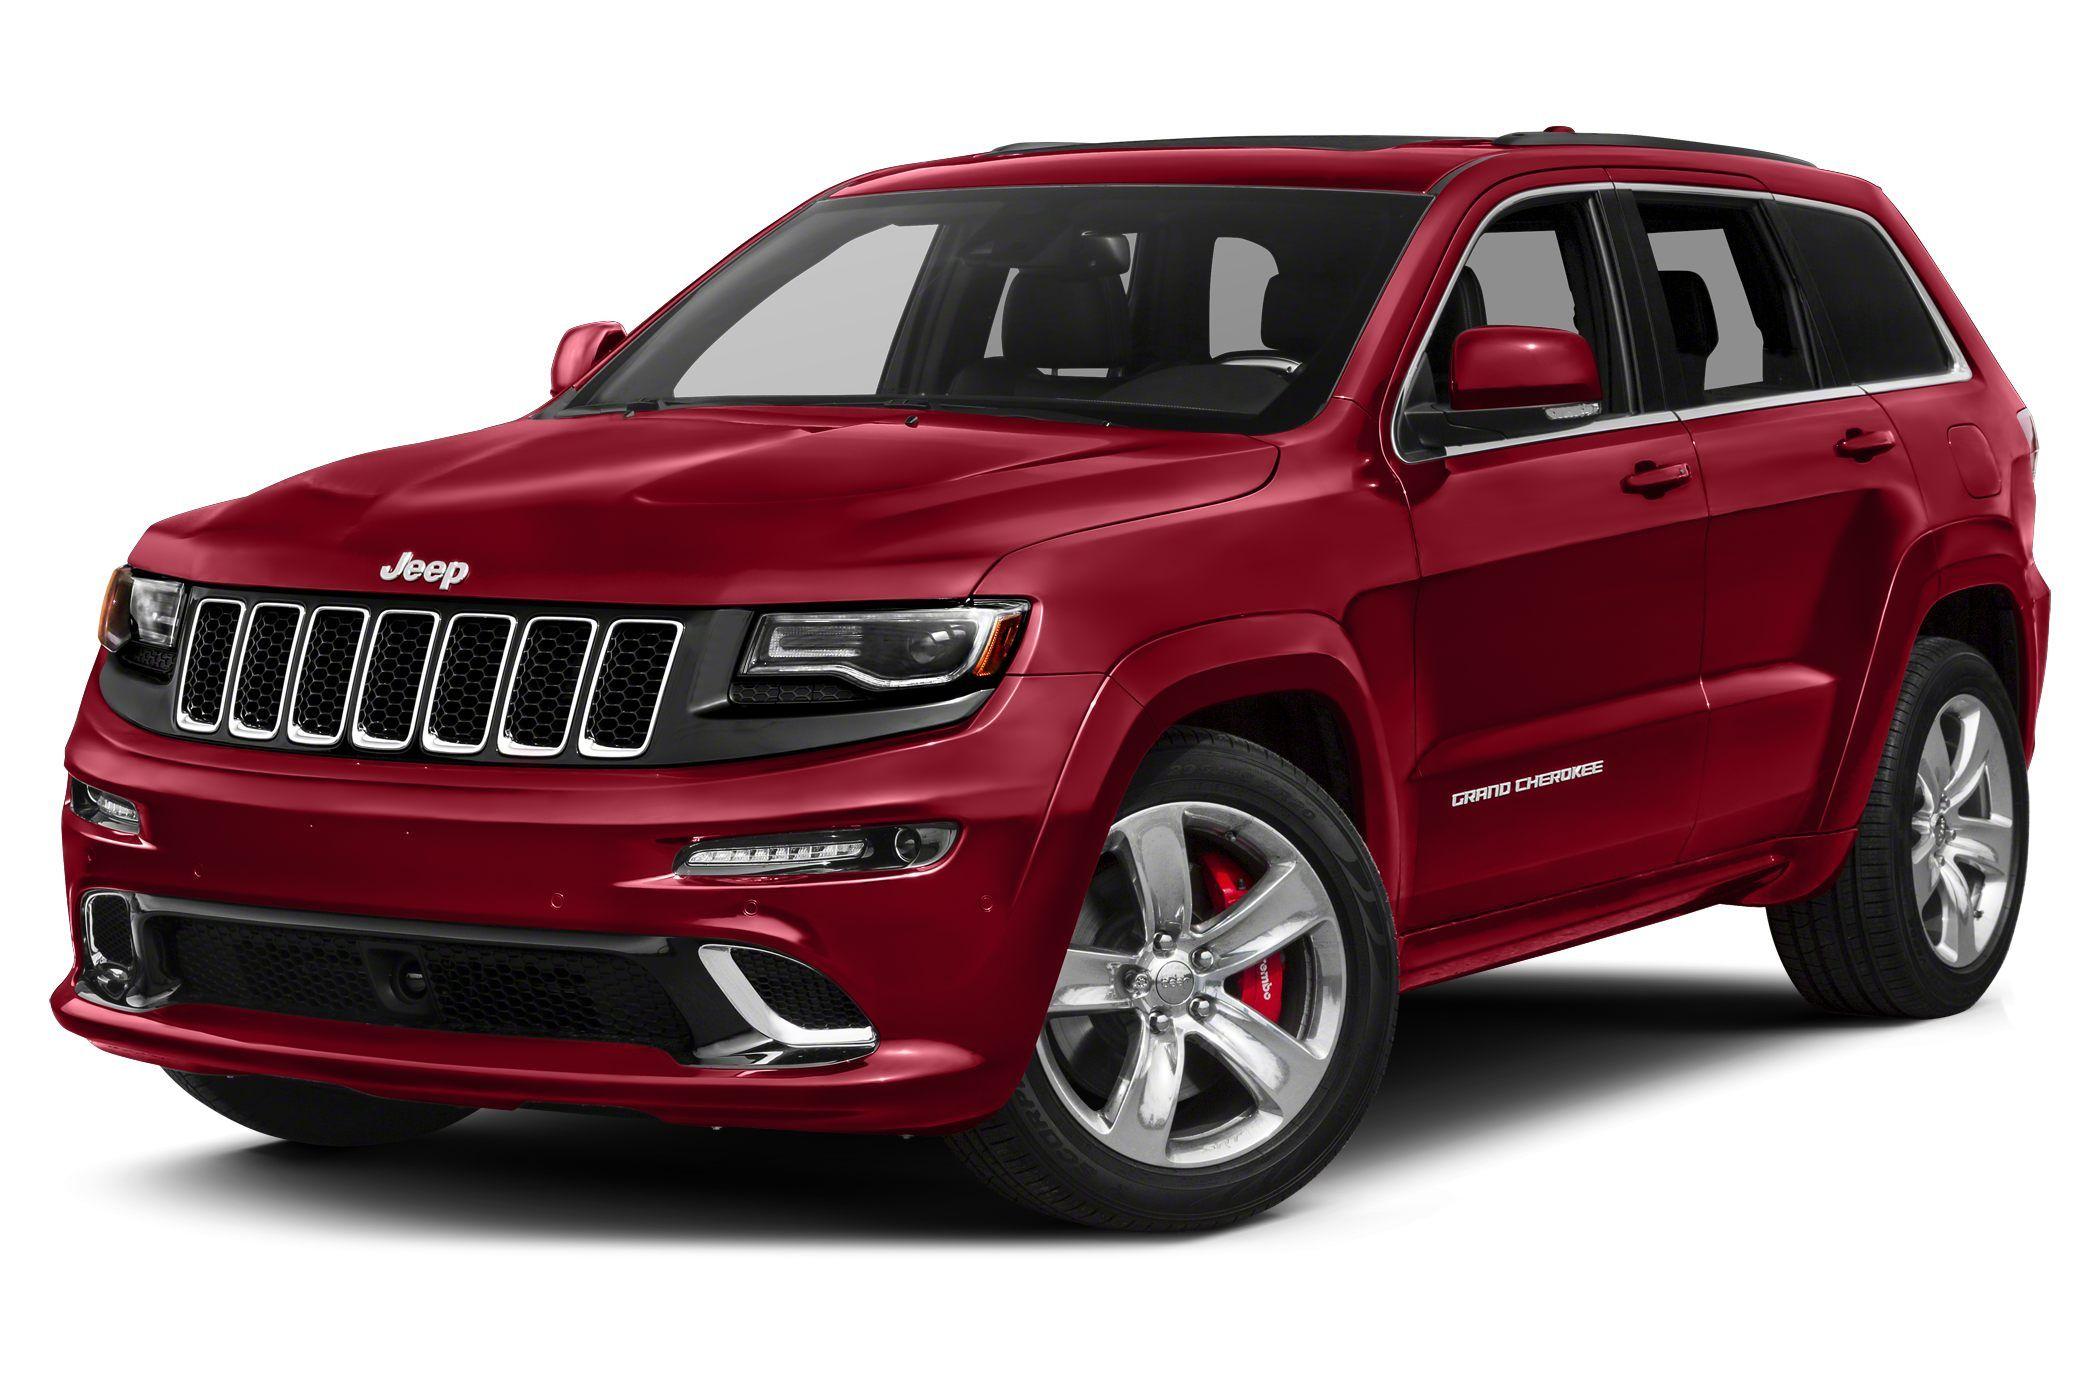 2020 Dodge Durango Diesel Srt8 Check more at http//www